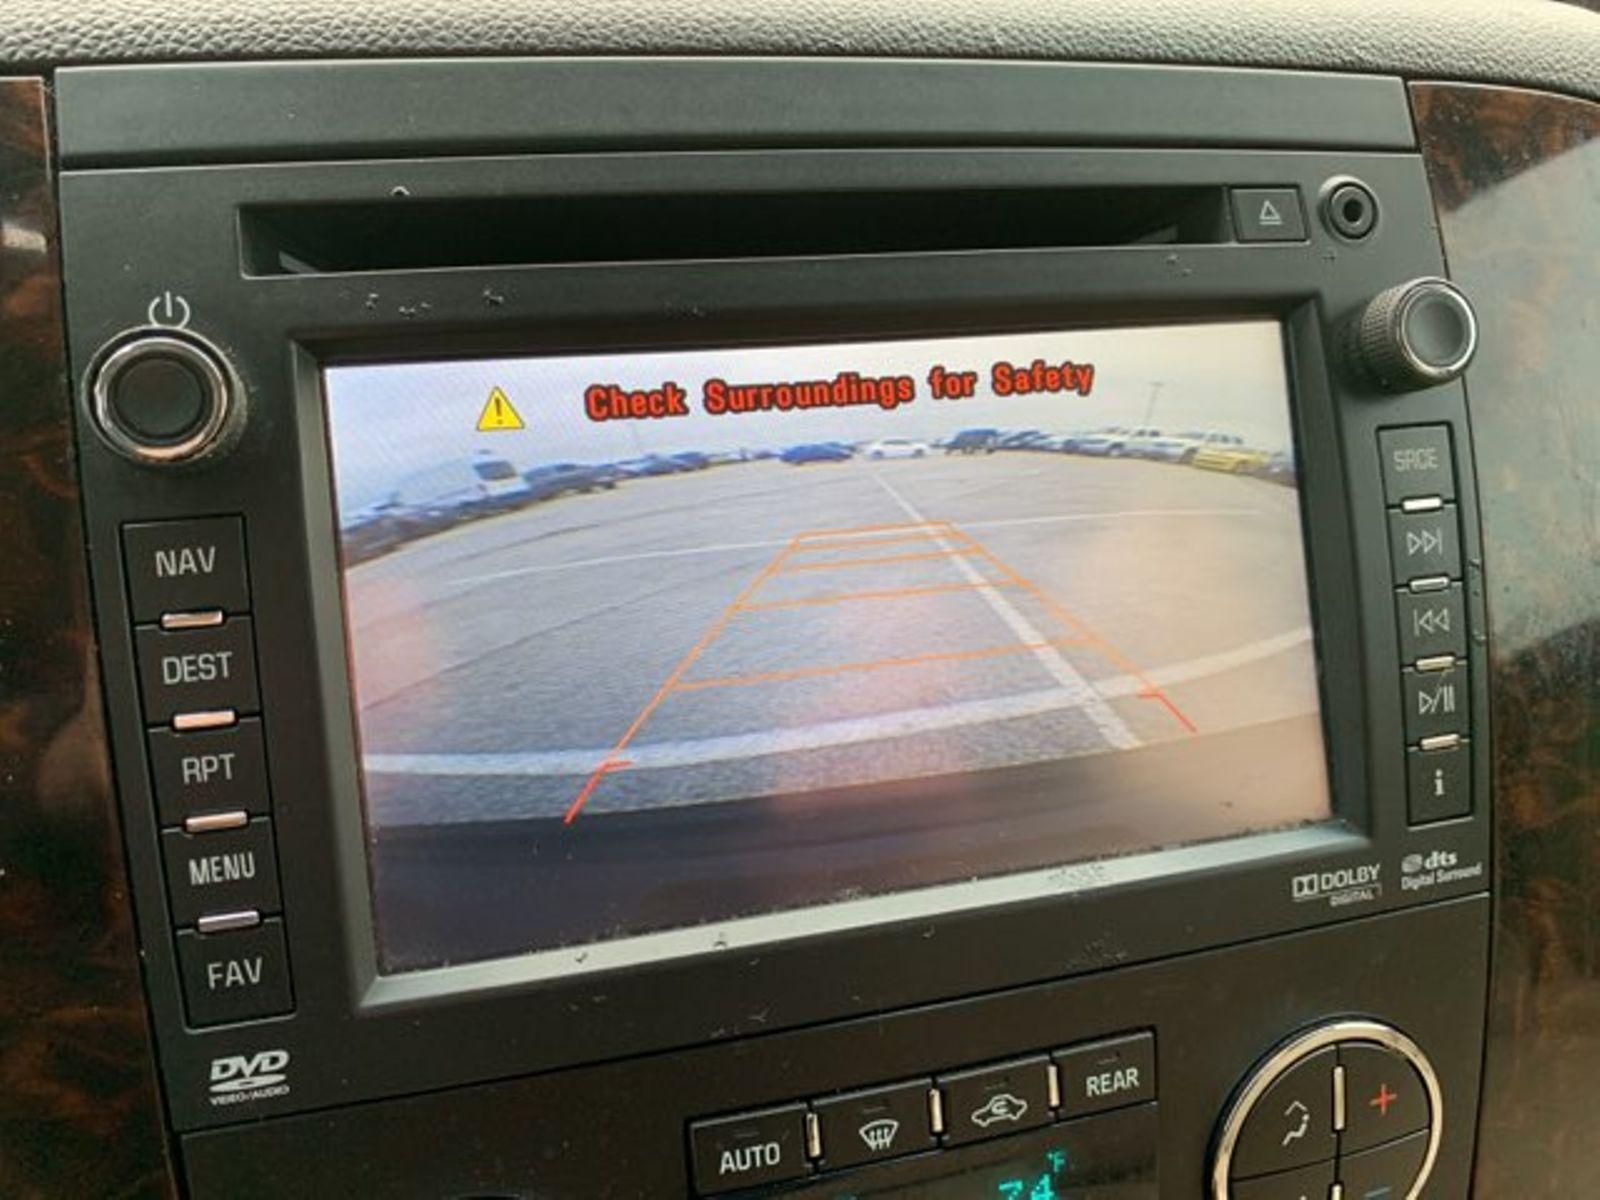 2013 Gmc Yukon Xl 1500 Denali City Tx Mm Enterprise Motors Envoy Shift Interlock System Wiring In Dallas